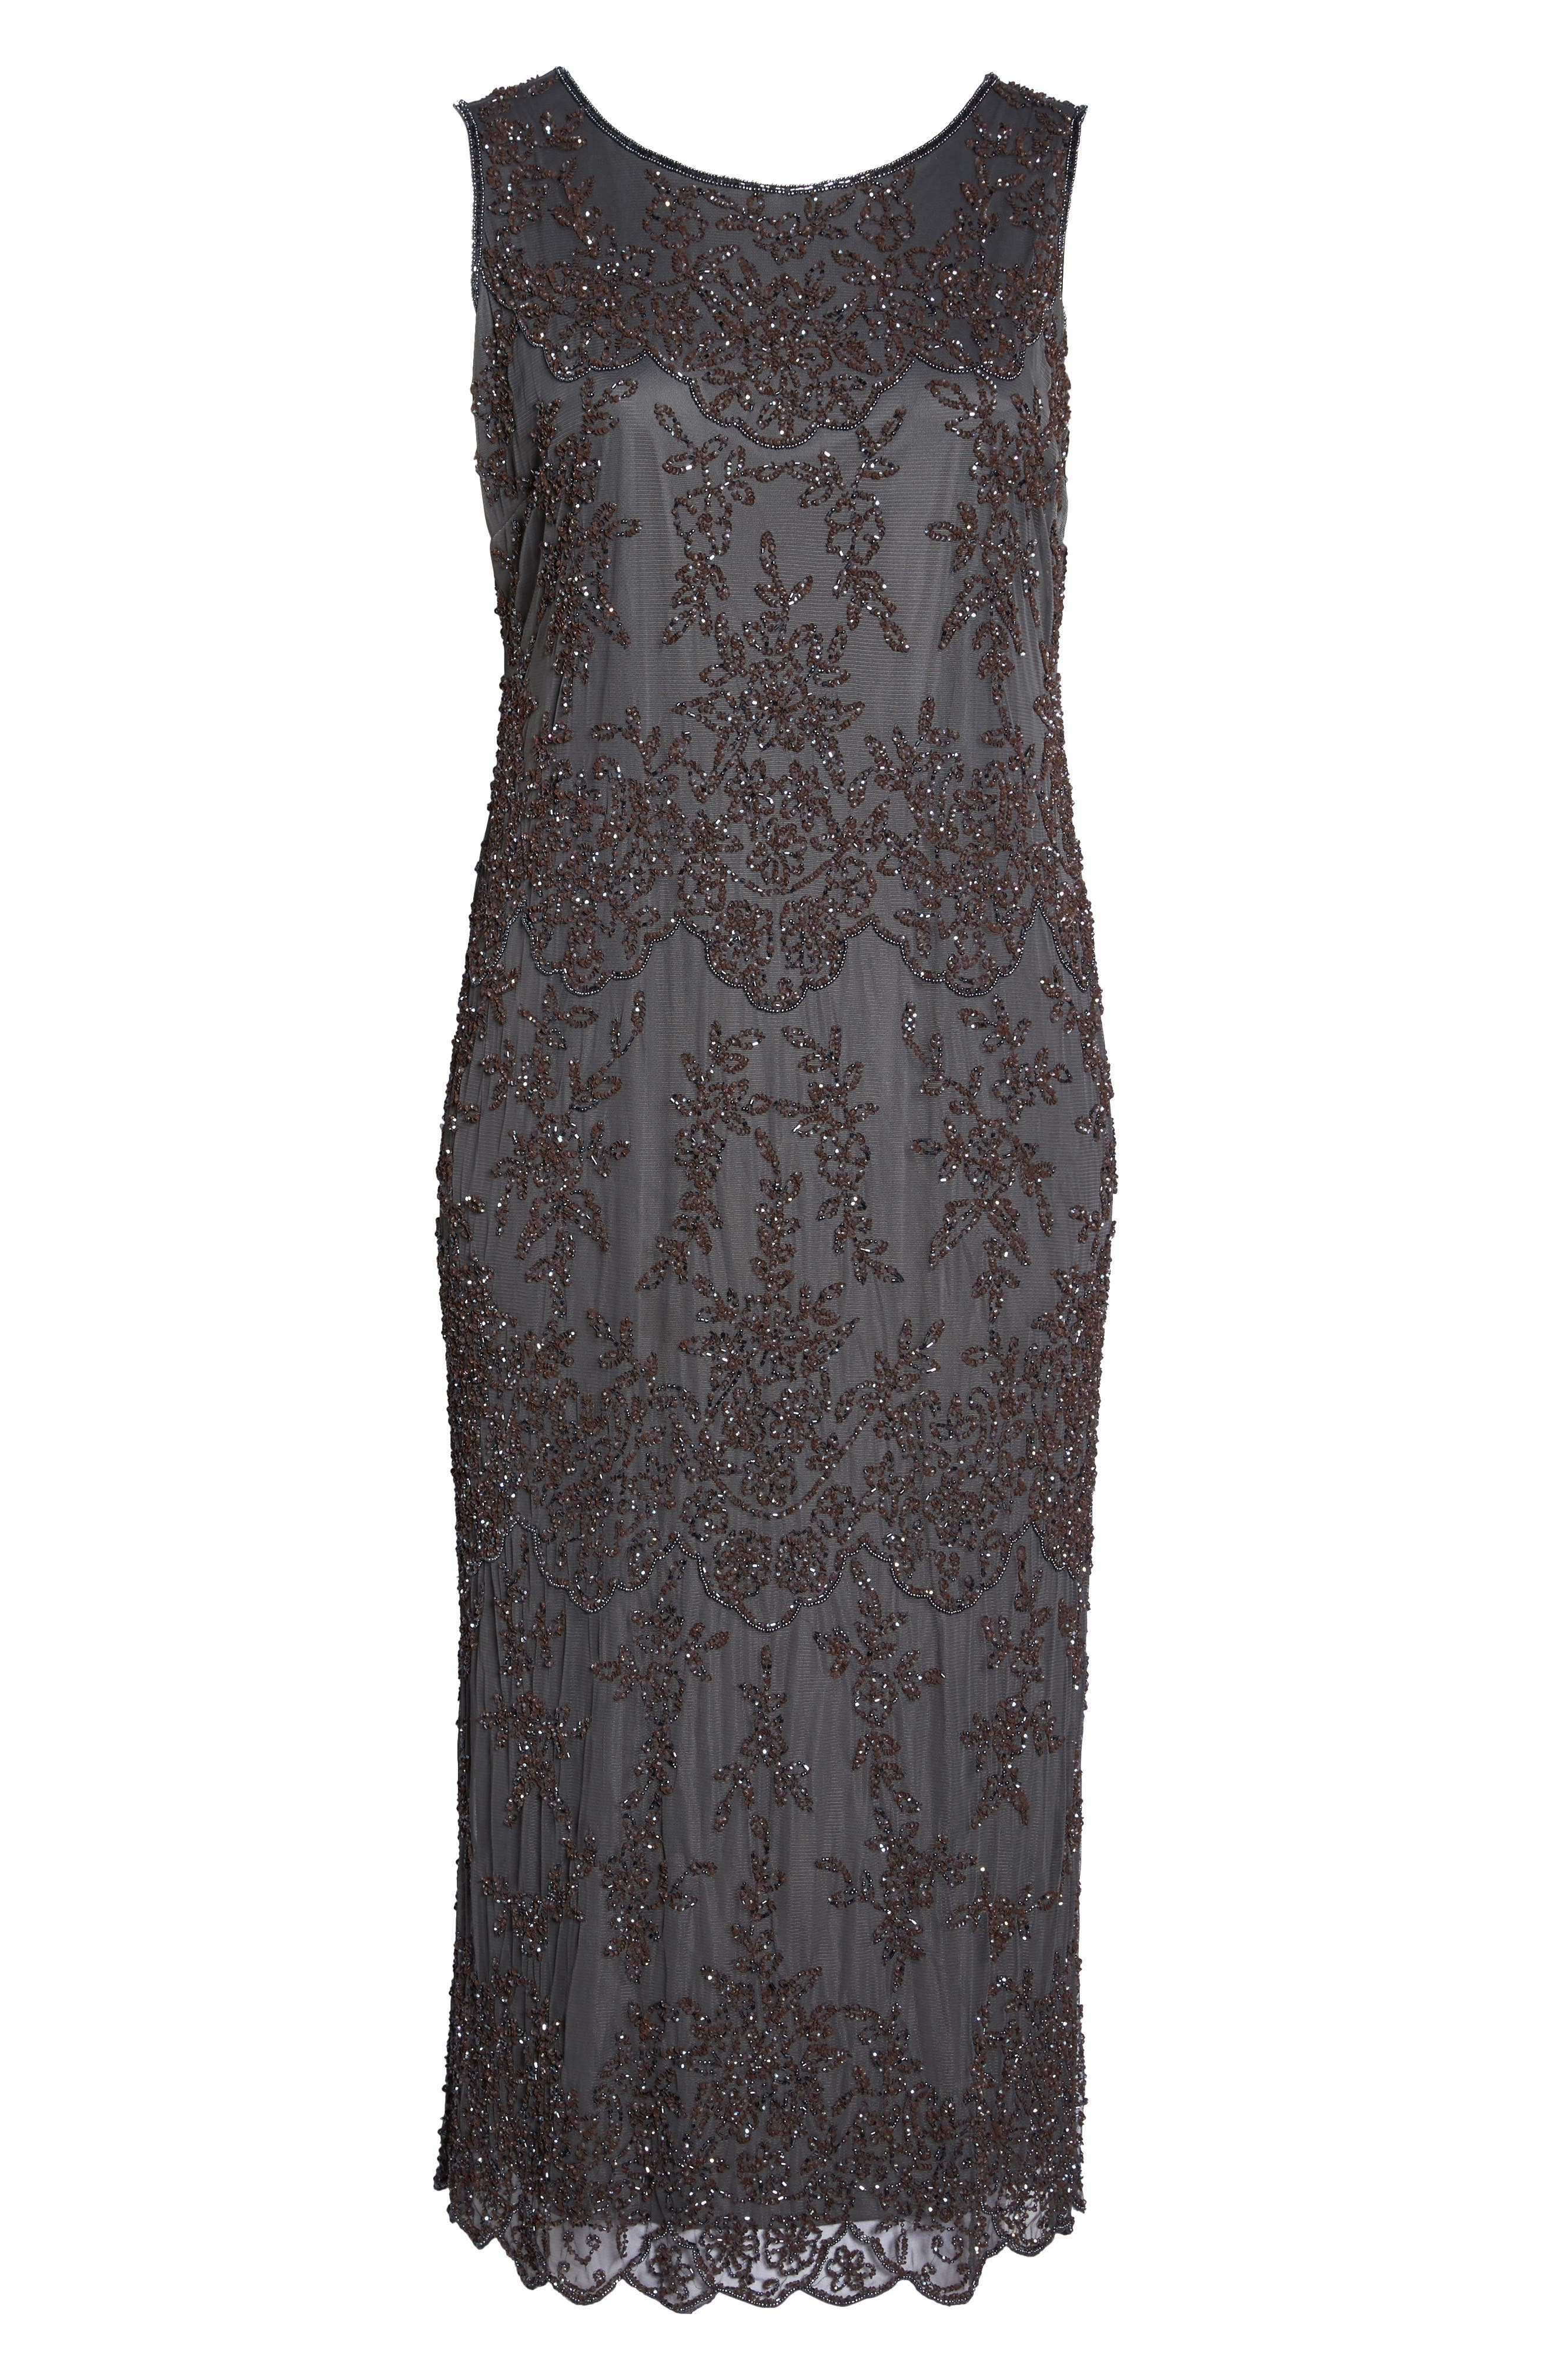 Embellished Bateau Neck Long Dress,                             Alternate thumbnail 6, color,                             020